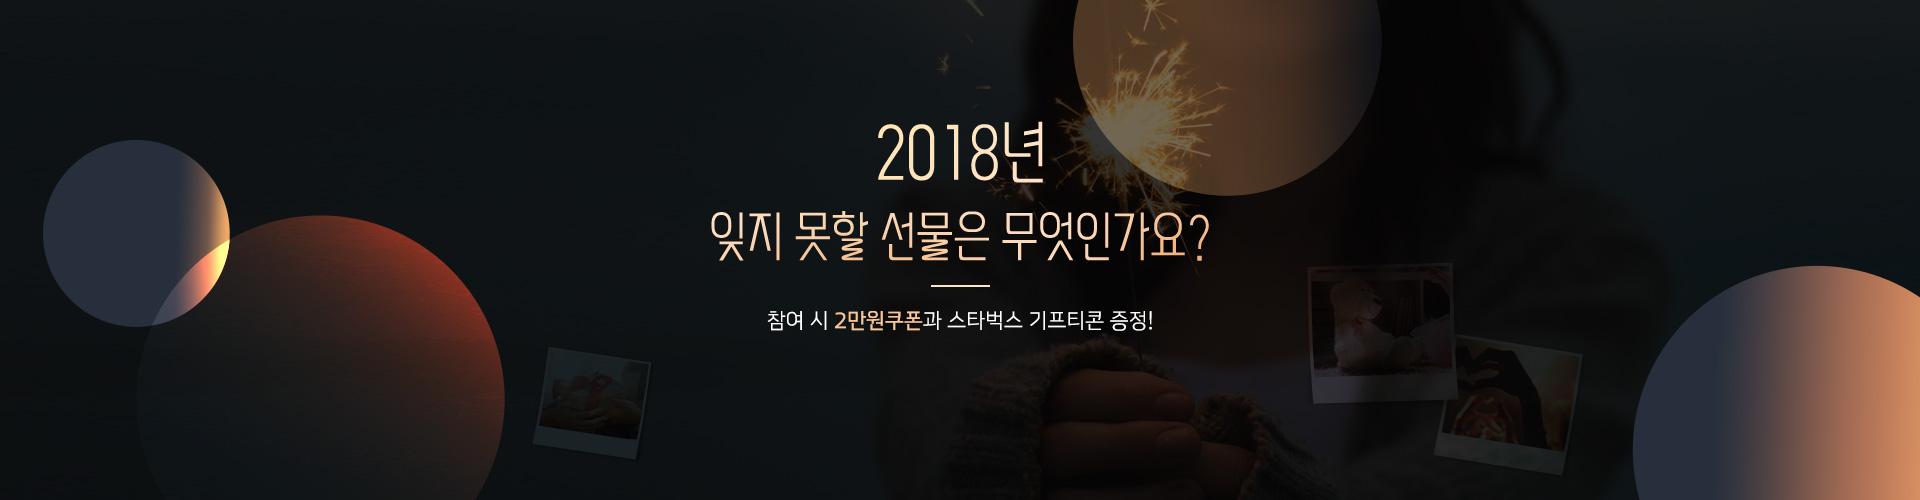 good-bye2018_댓글이벤트